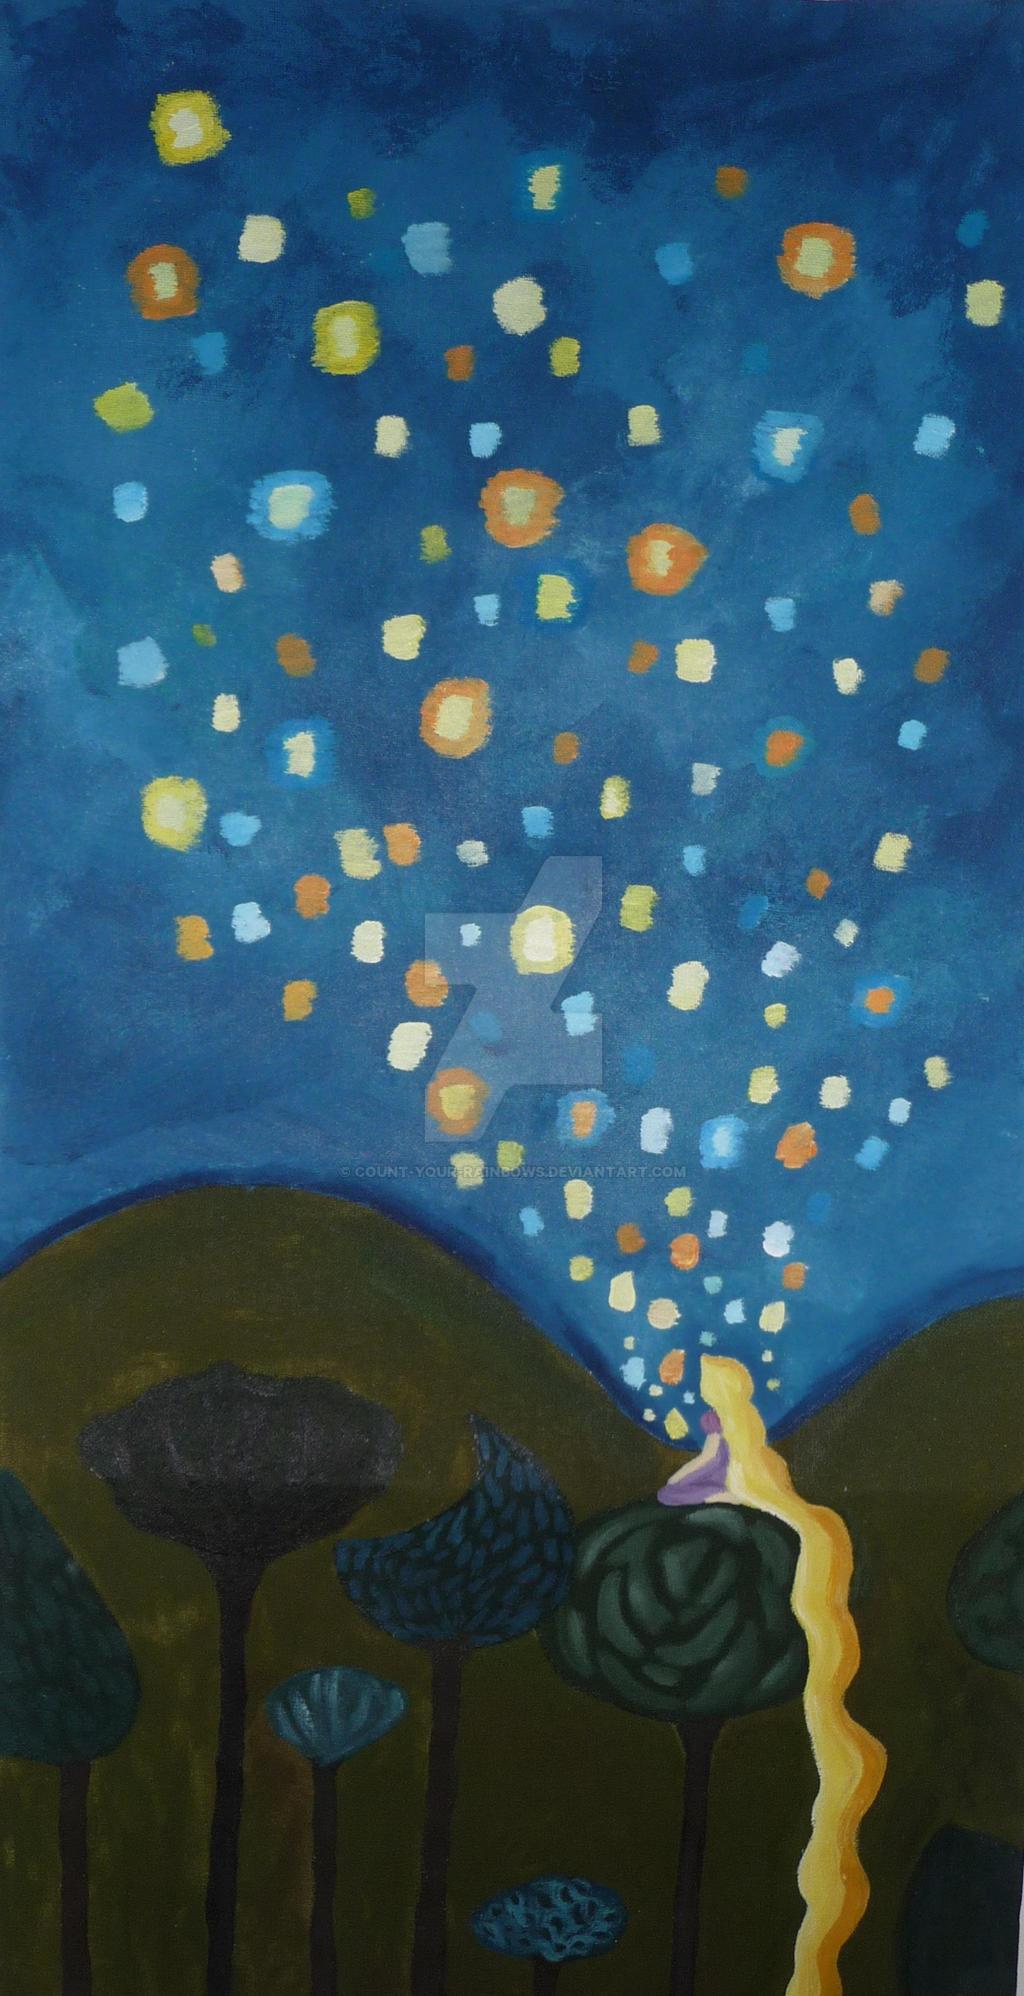 Rapunzel's Dream by Count-Your-Rainbows on DeviantArt